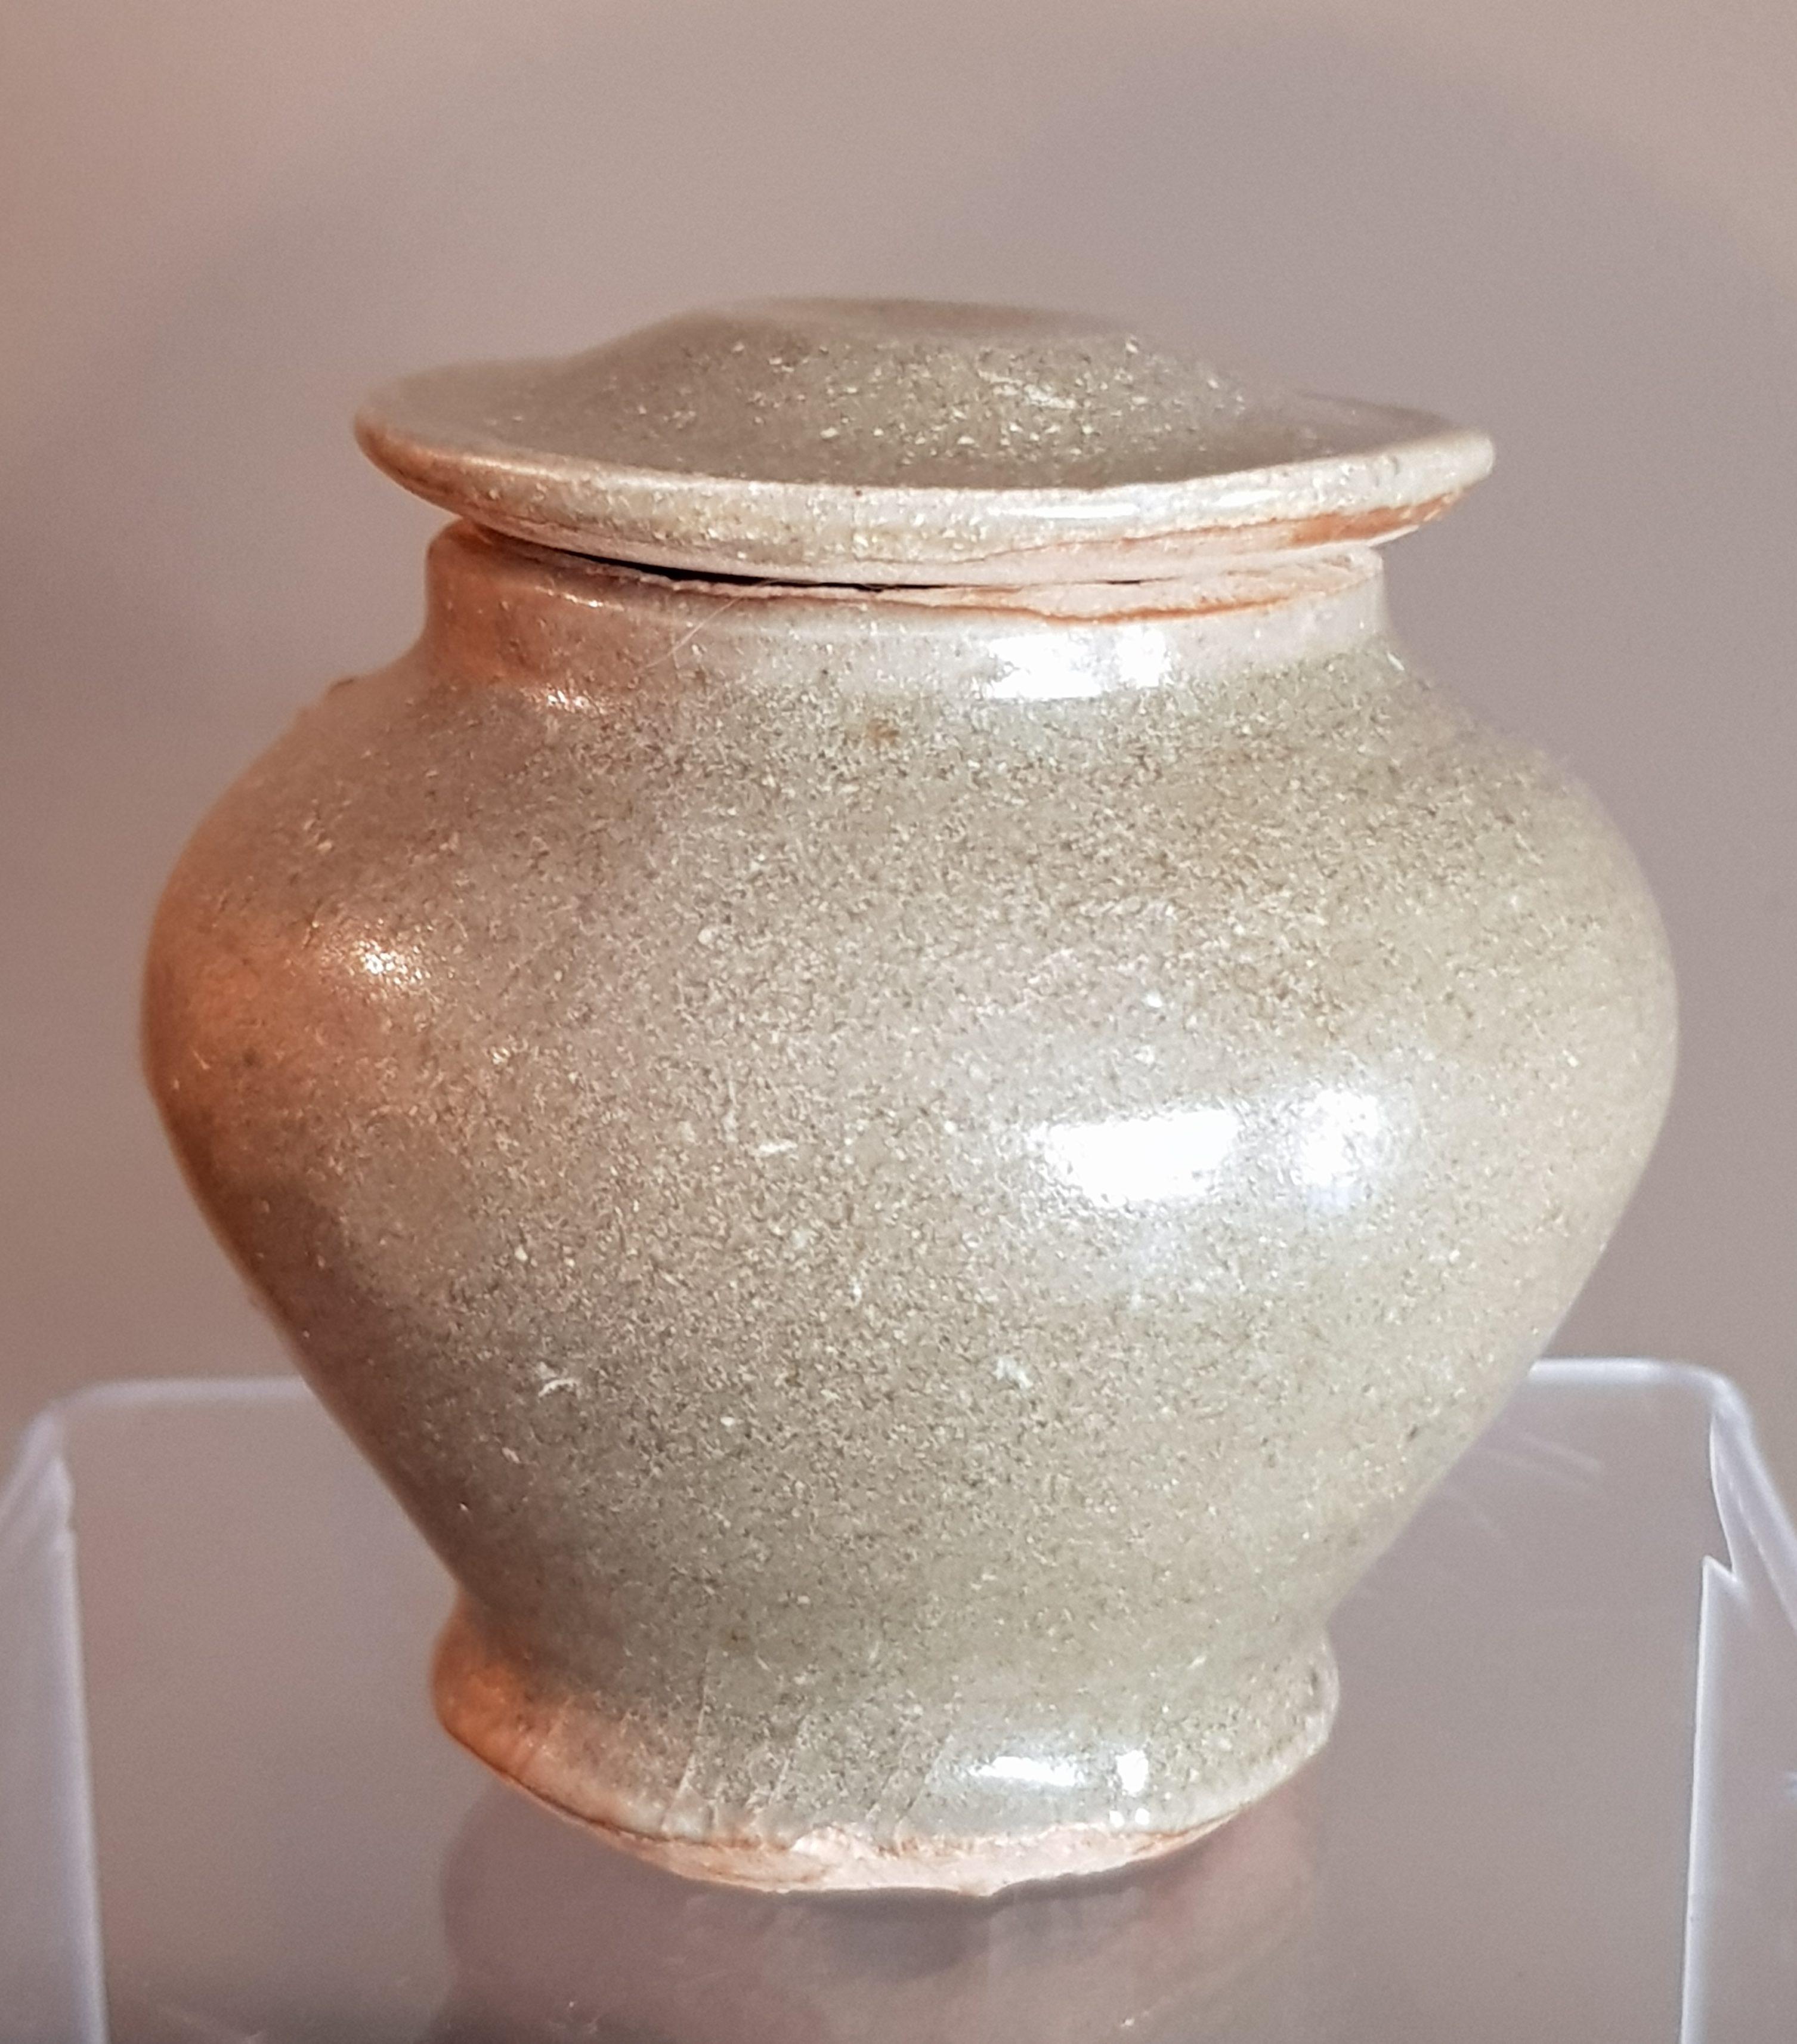 Petite urne Céladon - Dynastie Ming - VENDU Image